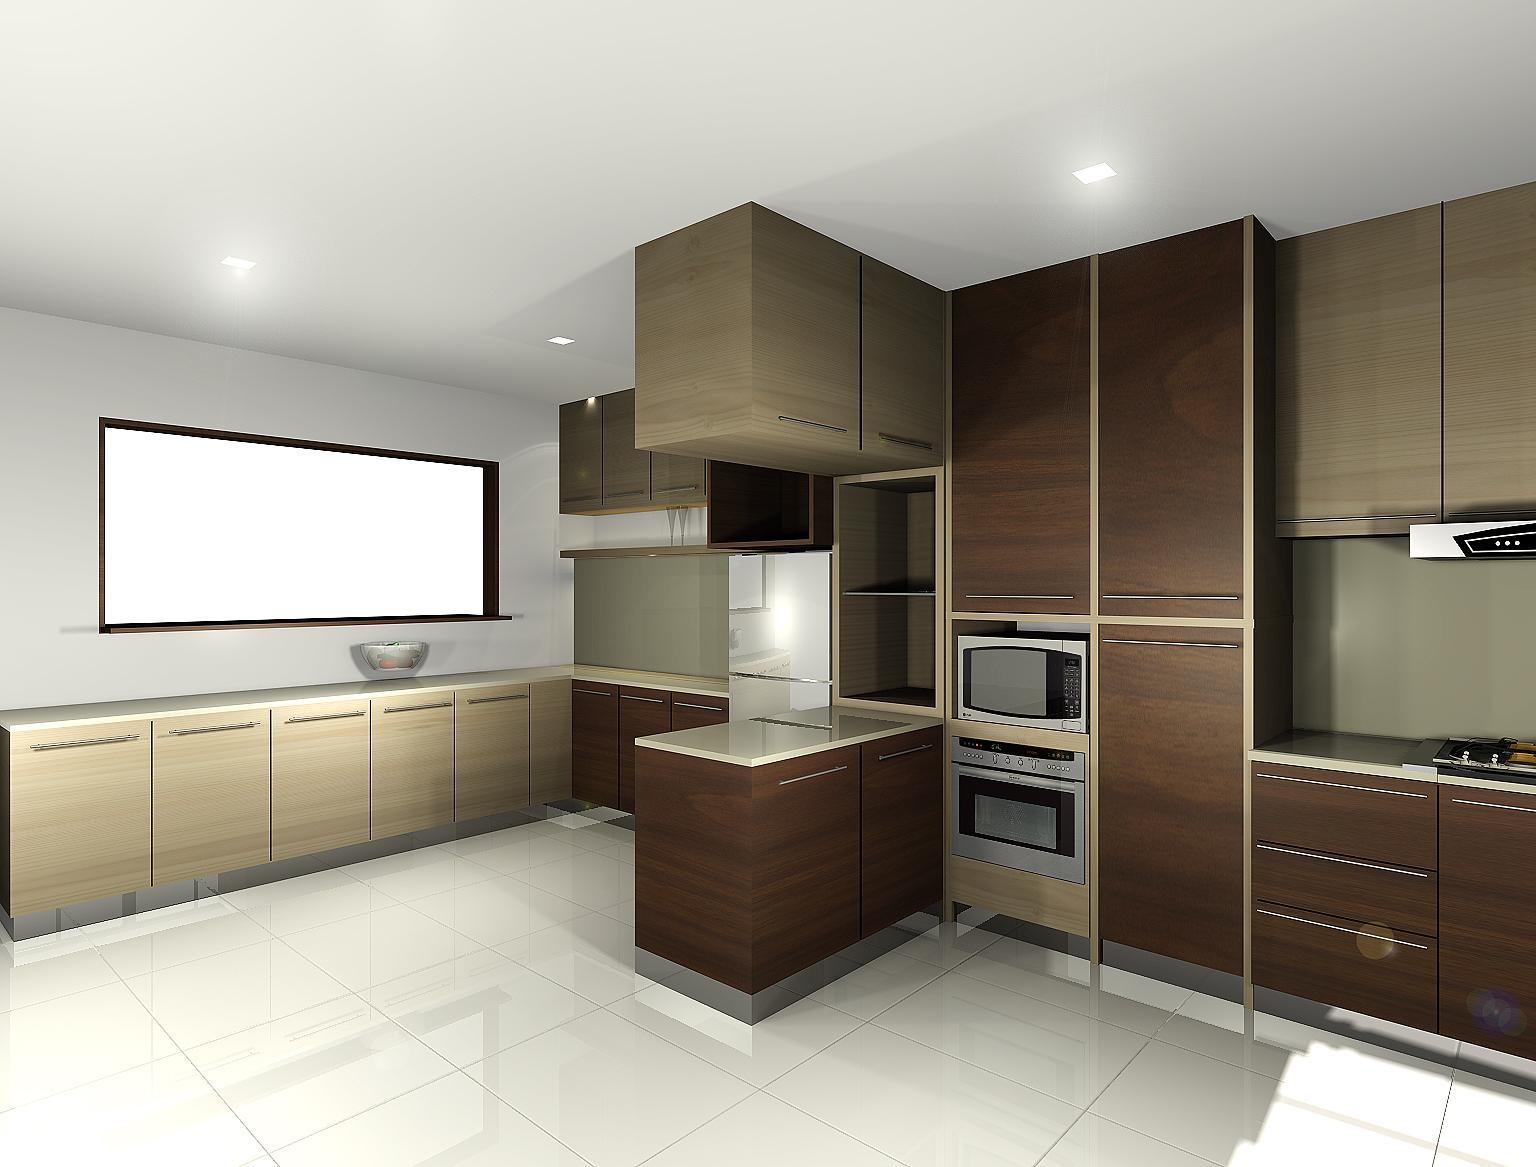 Mica Interior Design And Construction: Kitchen Cabinet